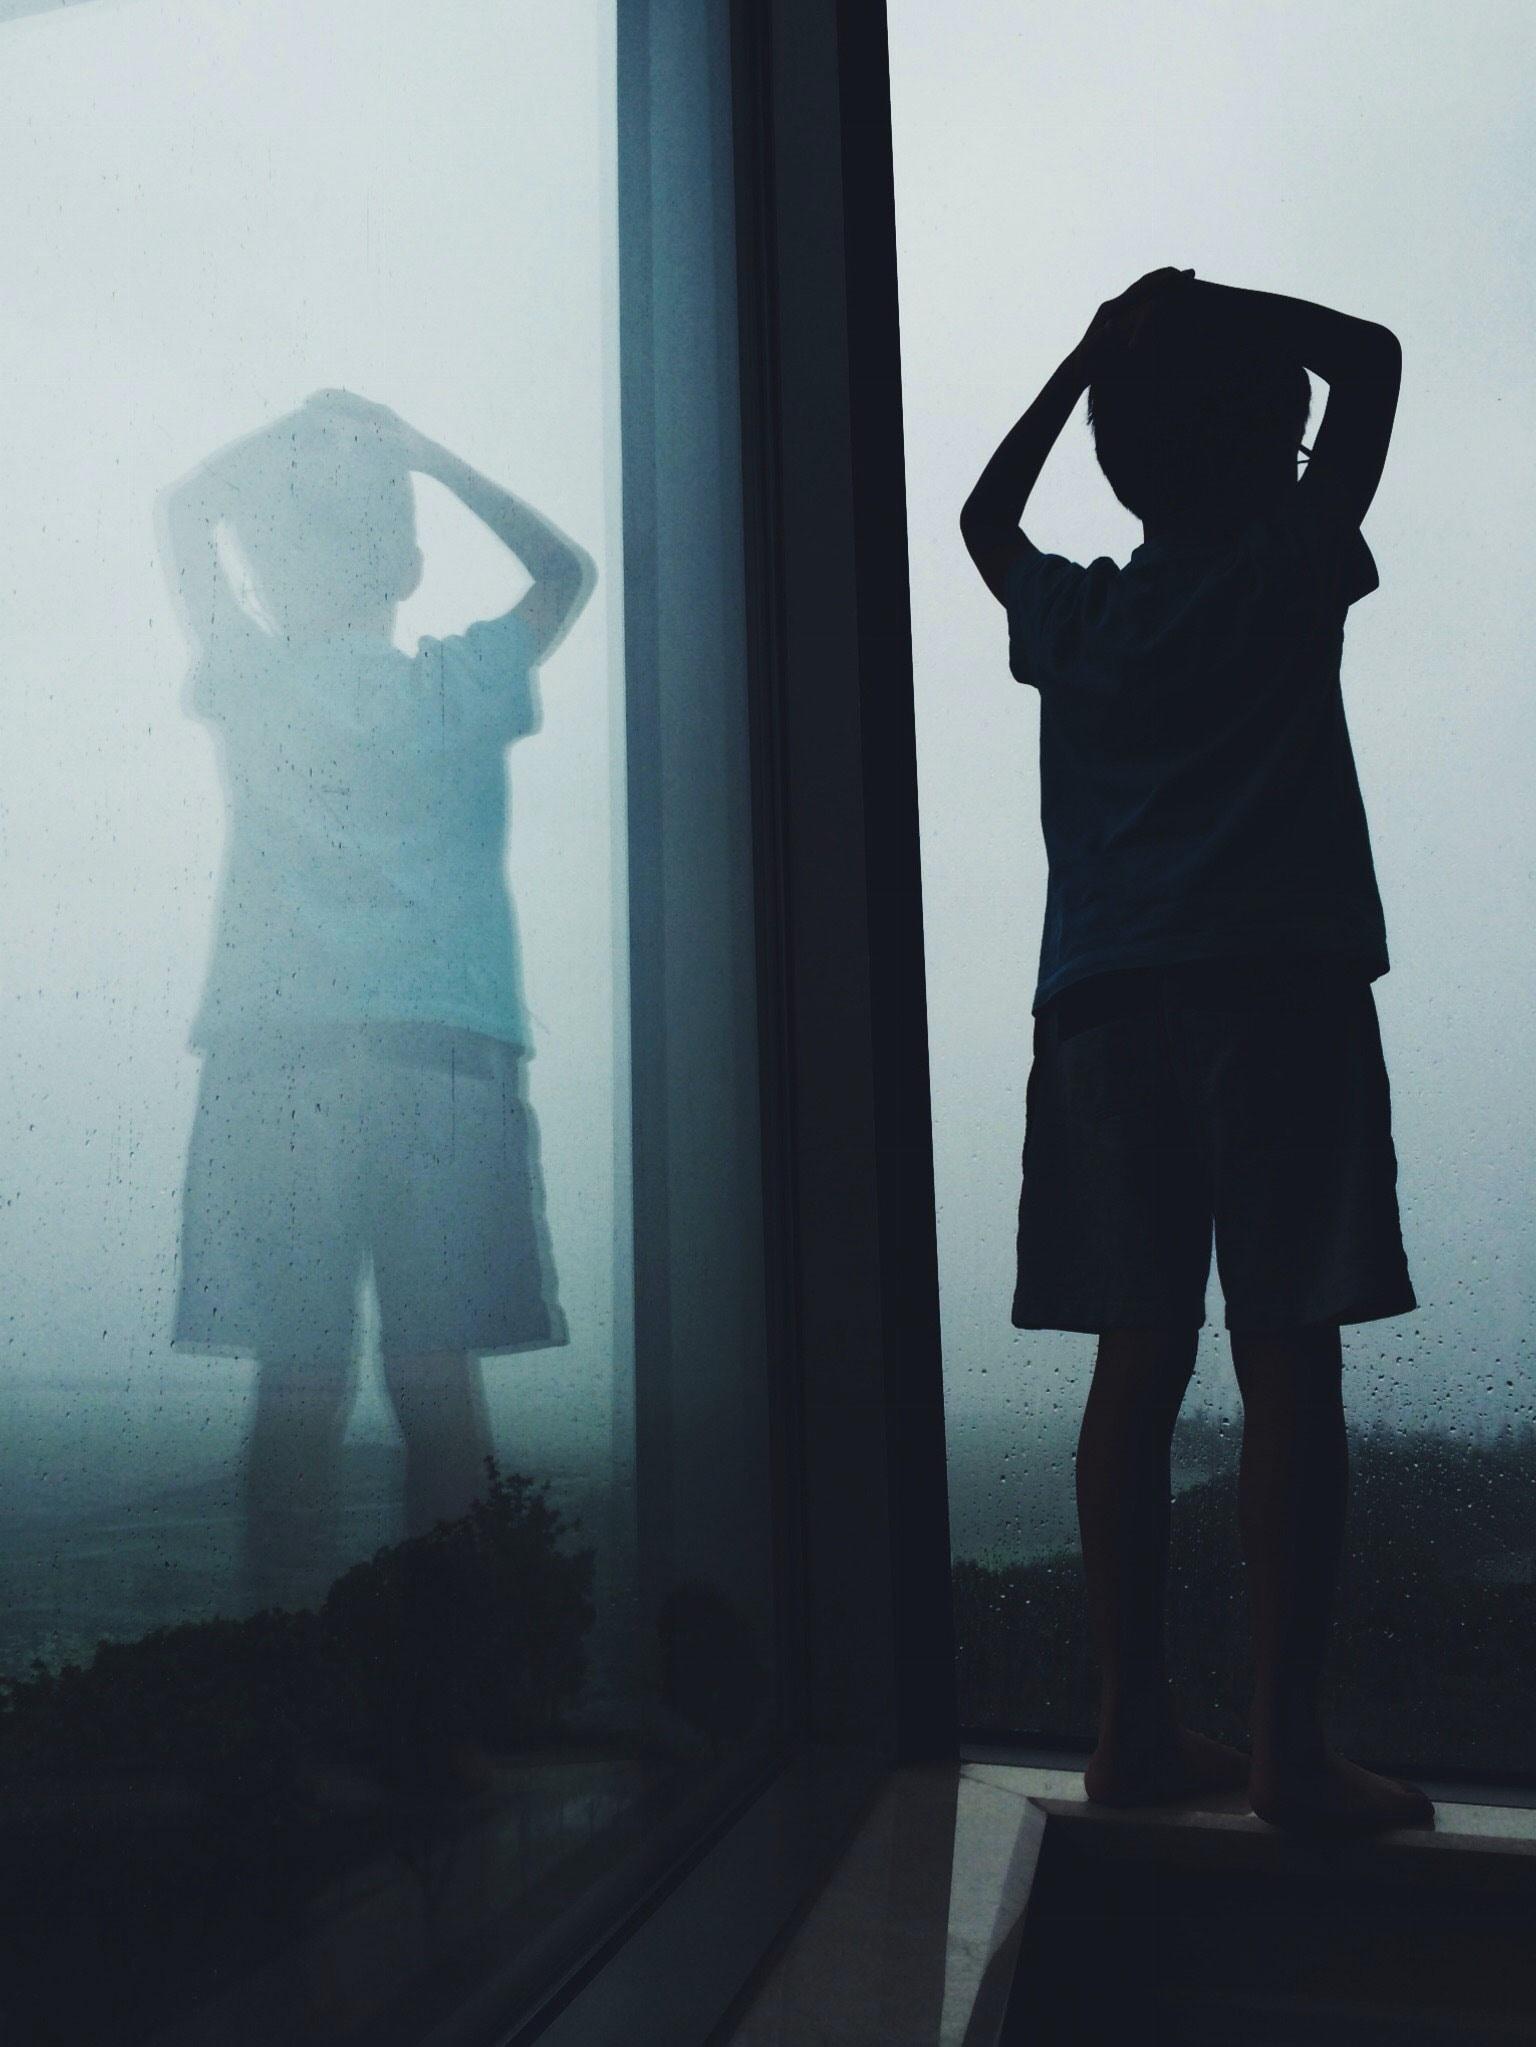 boy near clear glass window